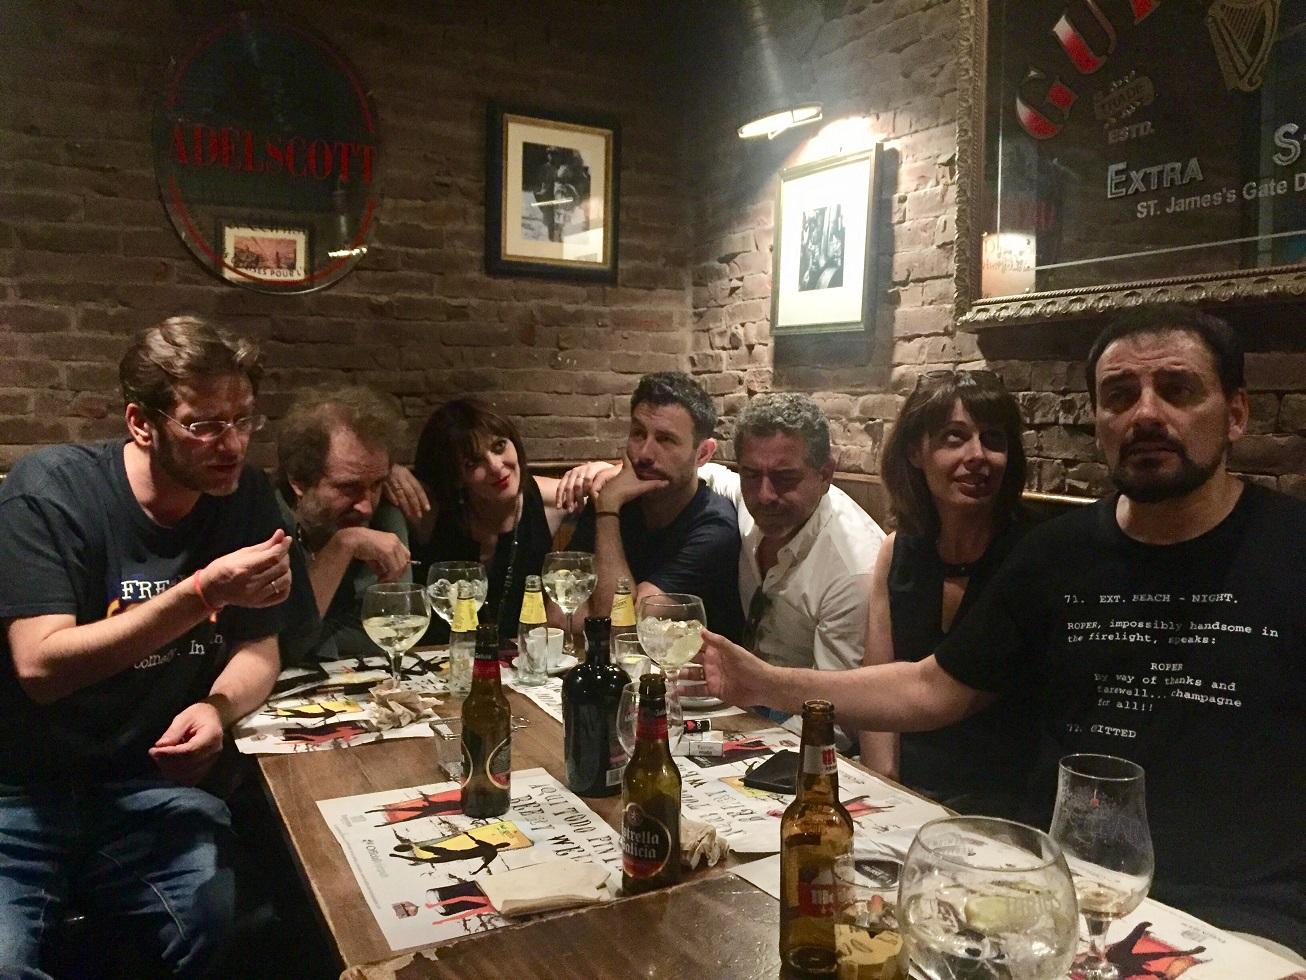 Comikazes - Don Mauro - Iñaki Urrutia - Juan Solo - Diego Peña recién llegado de Zaragoza - Luis Álvaro - Dan Feist - Beer Station - Banzai